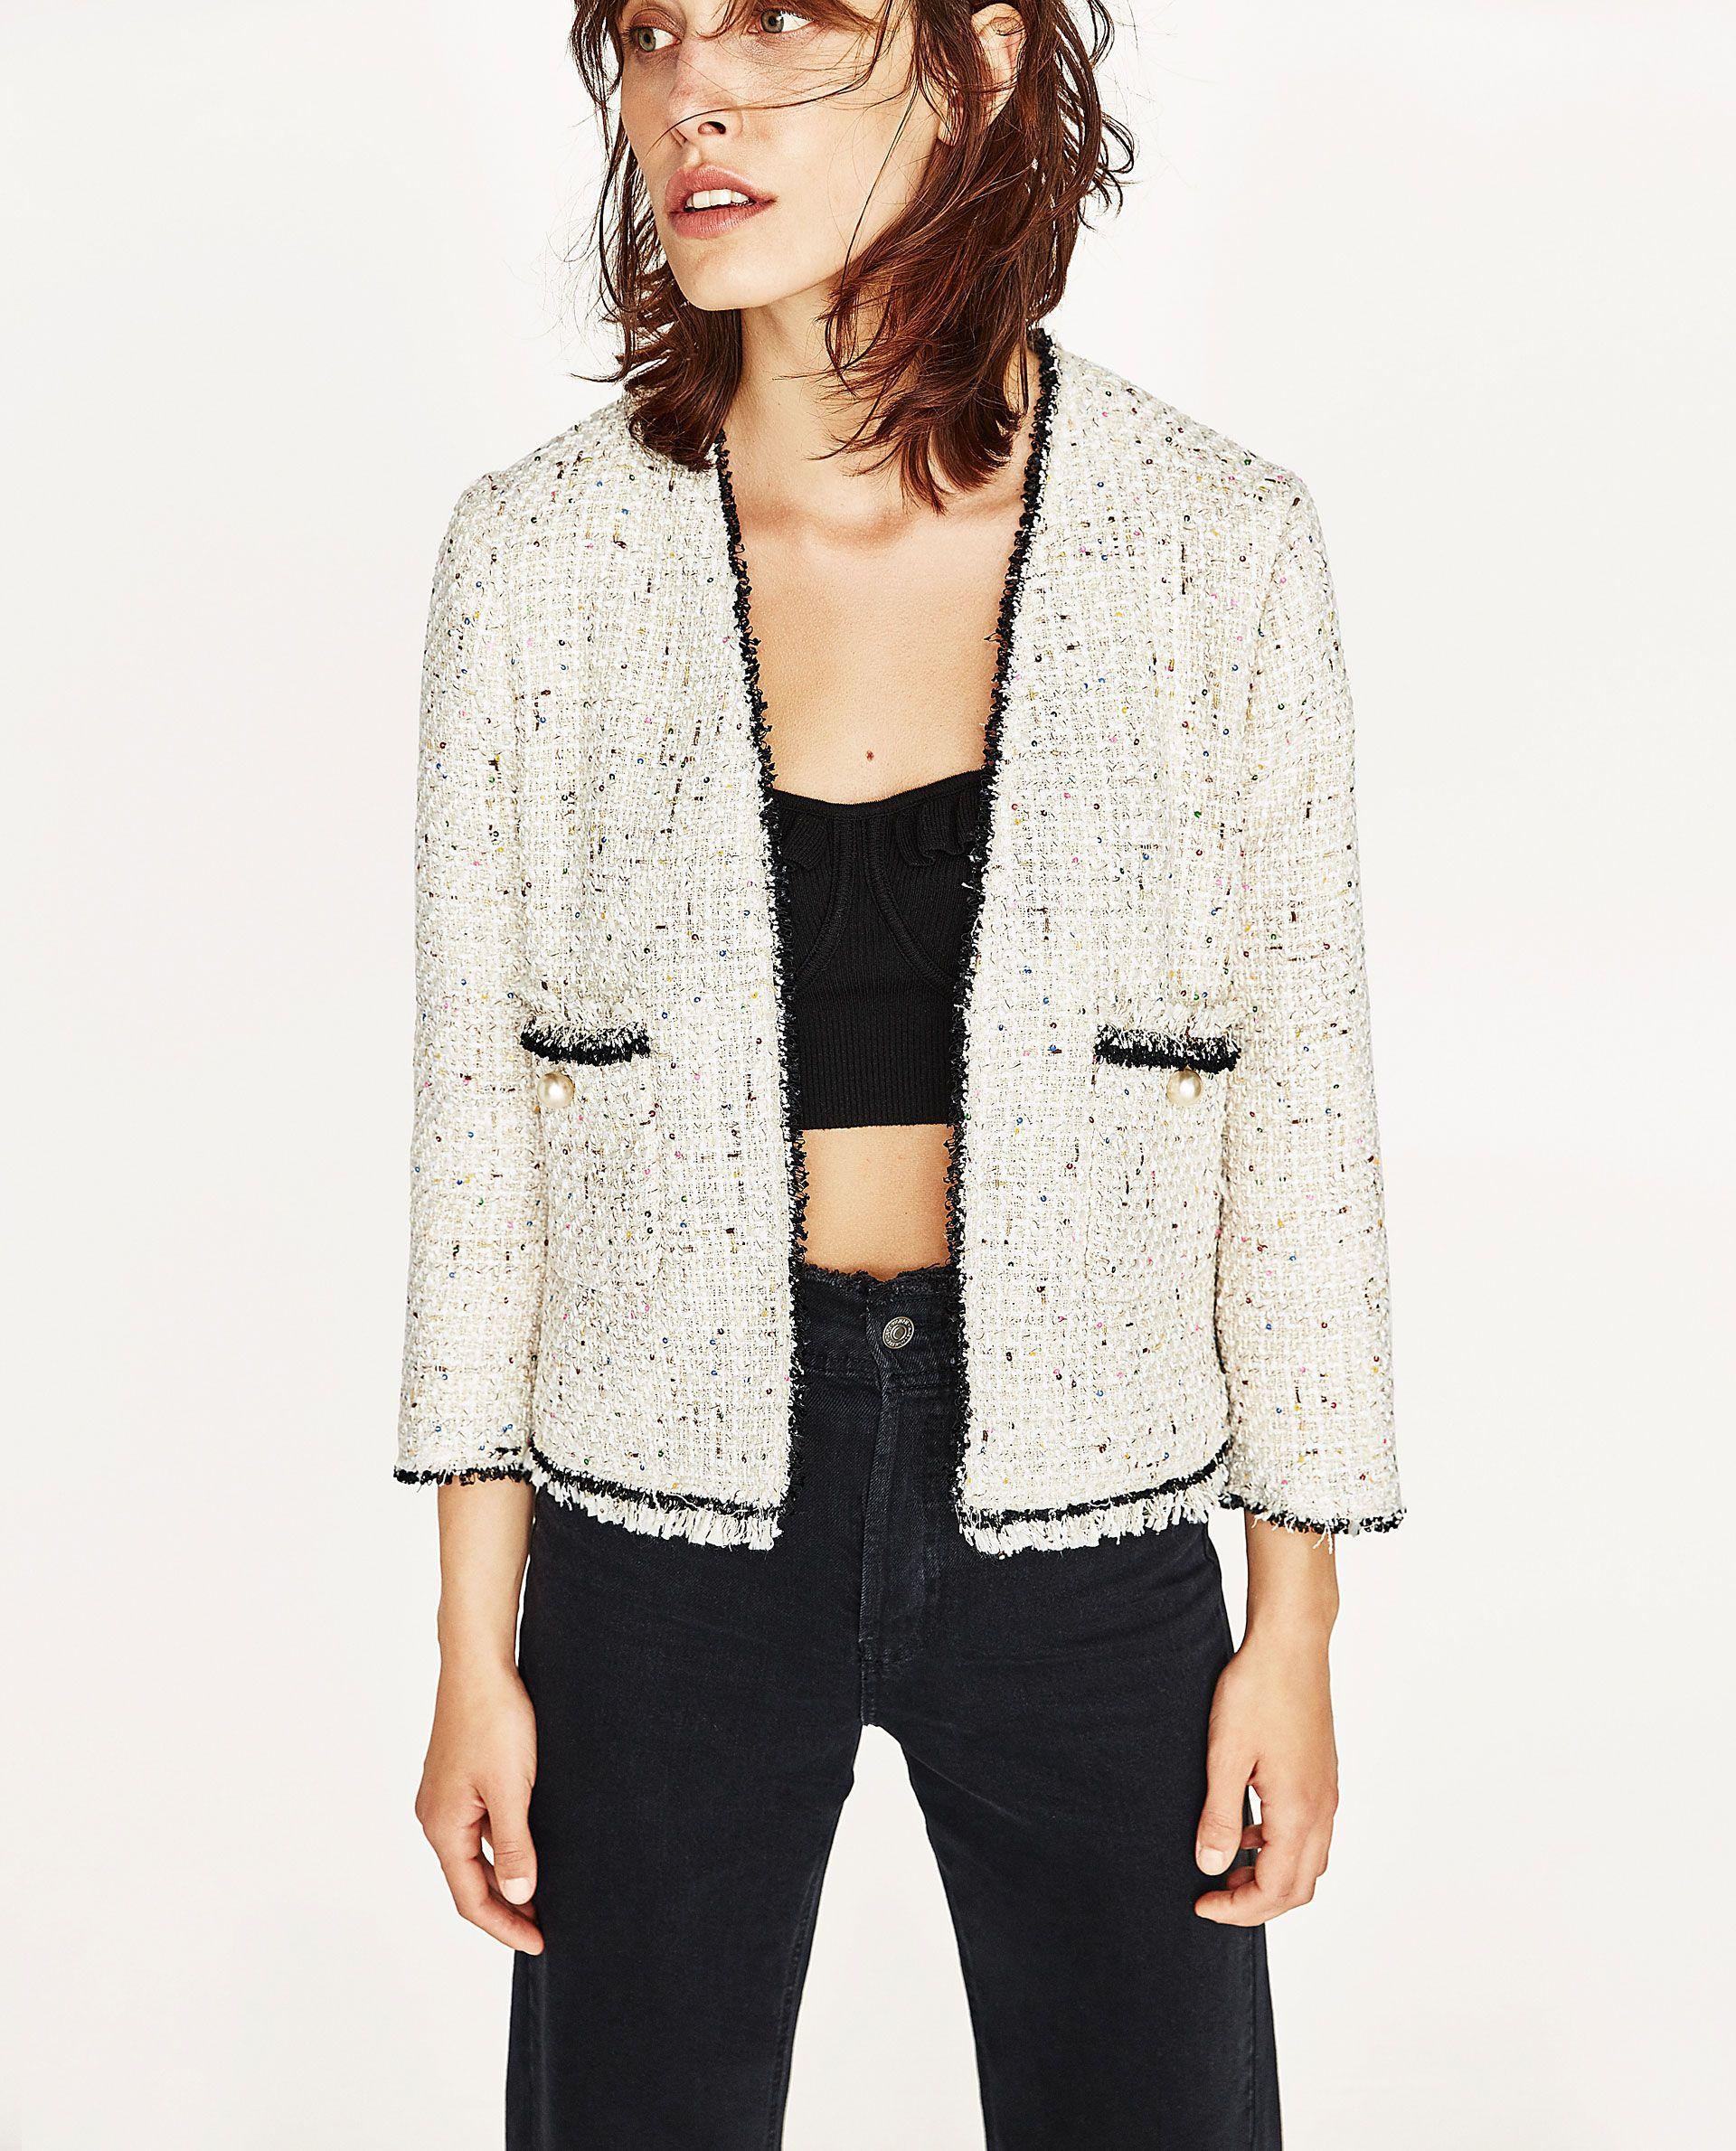 363f65cf53c8 SEQUINNED TWEED JACKET | Zara | Chanel tweed jacket, Tweed jacket ...